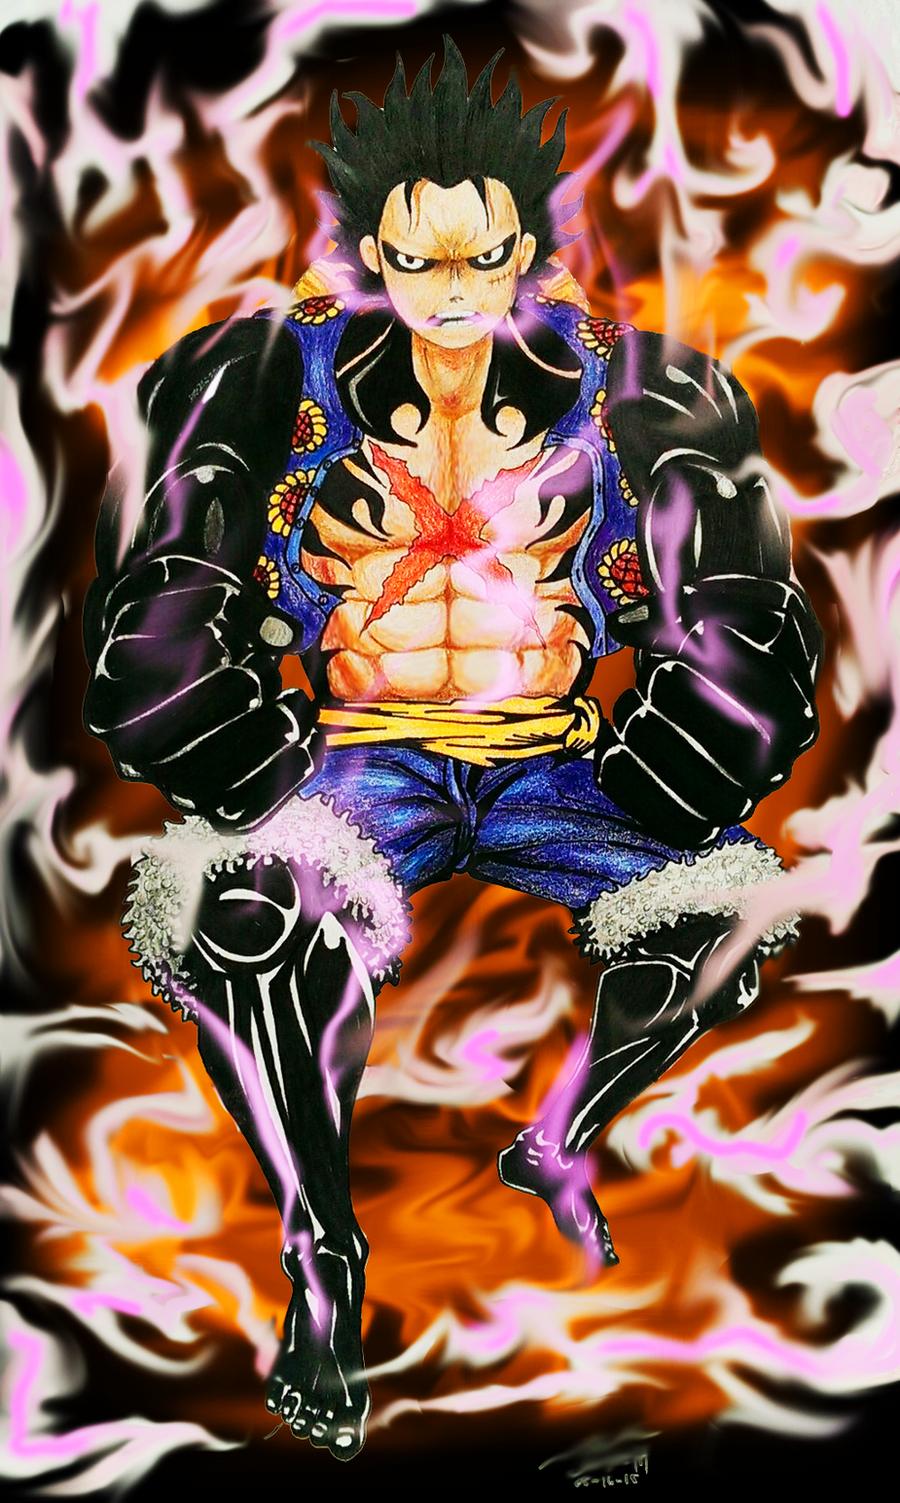 Luffy Gear 4 Tattoo: Luffy's Gear 4th By Jmanalabe On DeviantArt